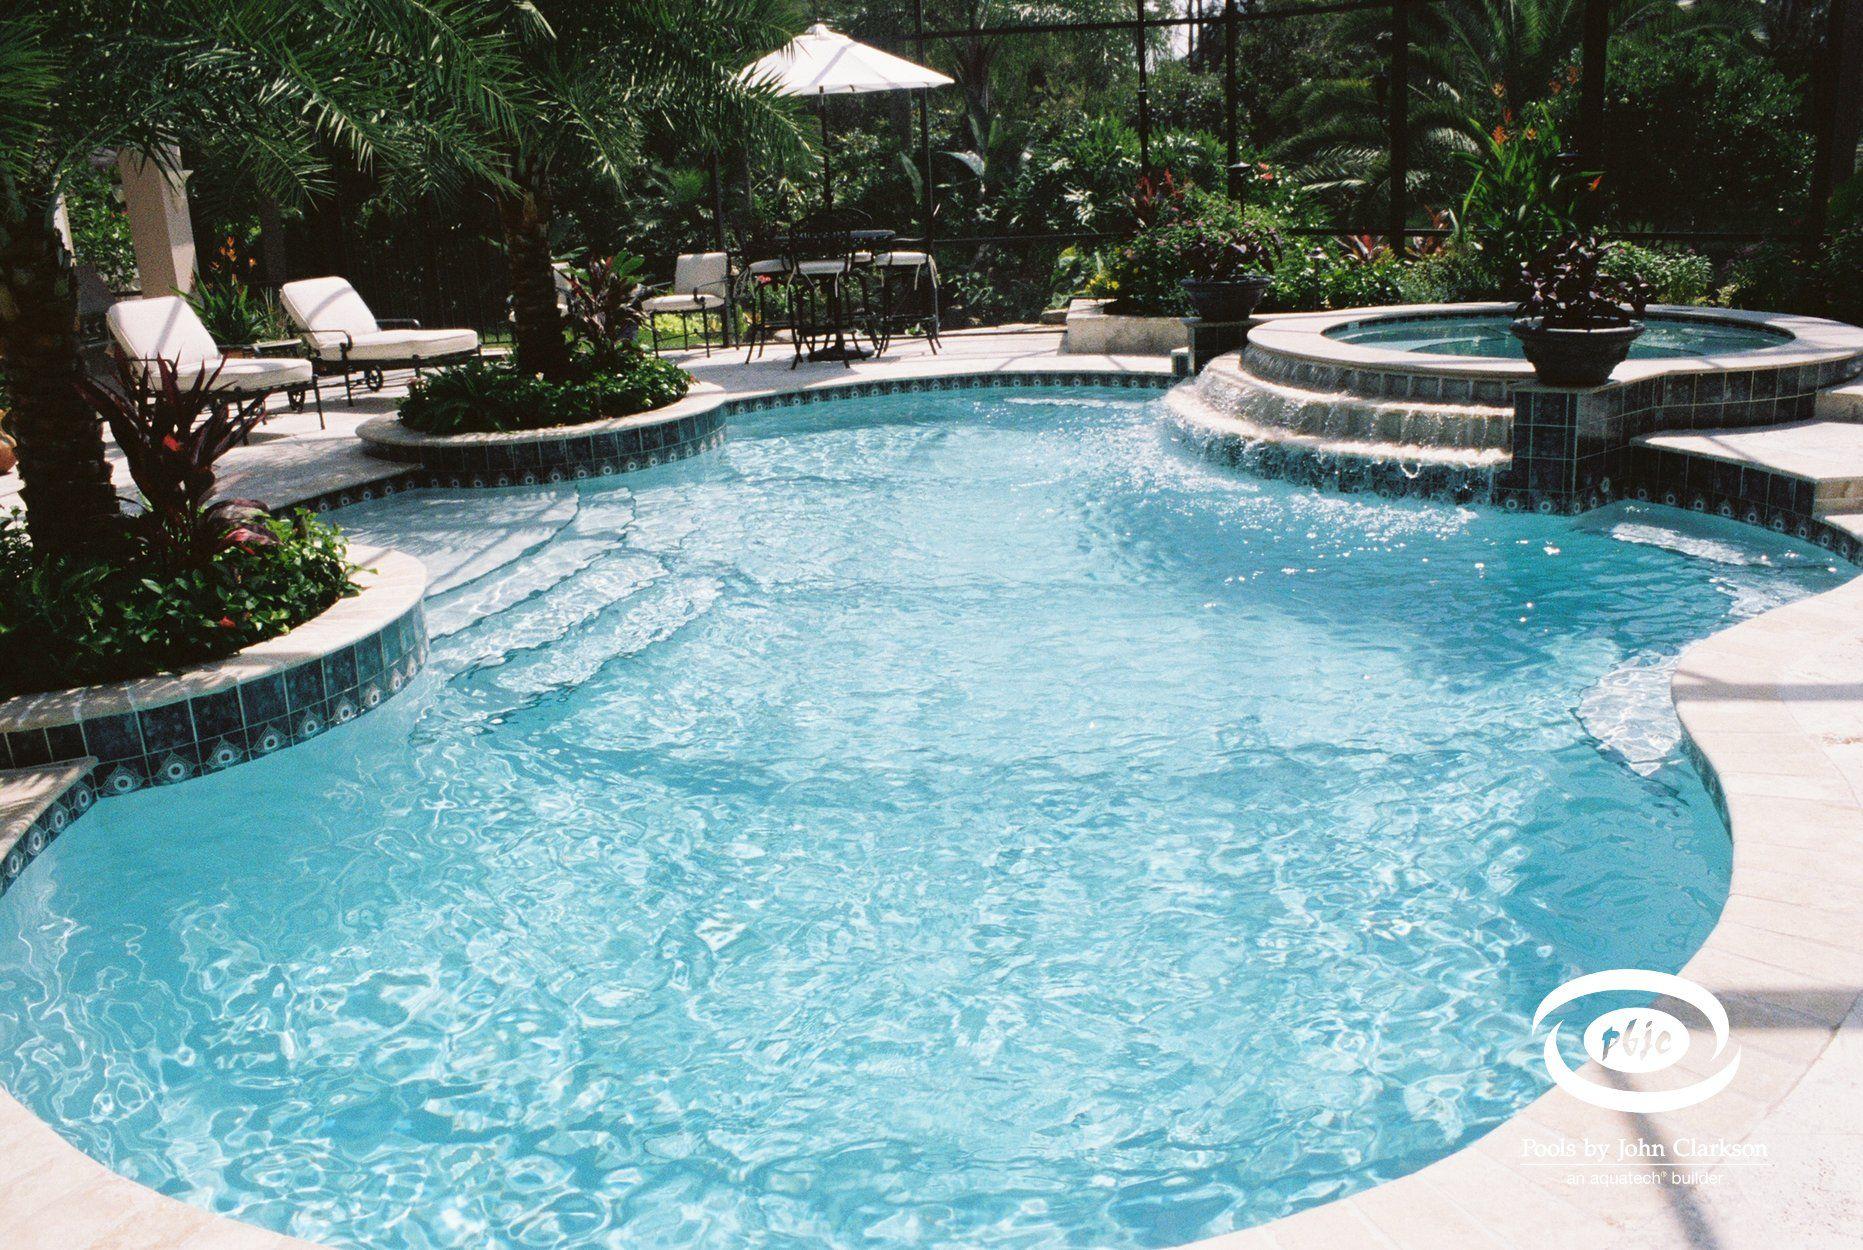 Freeform Pools 069 By Pools By John Clarkson Luxury Swimming Pools Swimming Pool Designs Swimming Pools Backyard